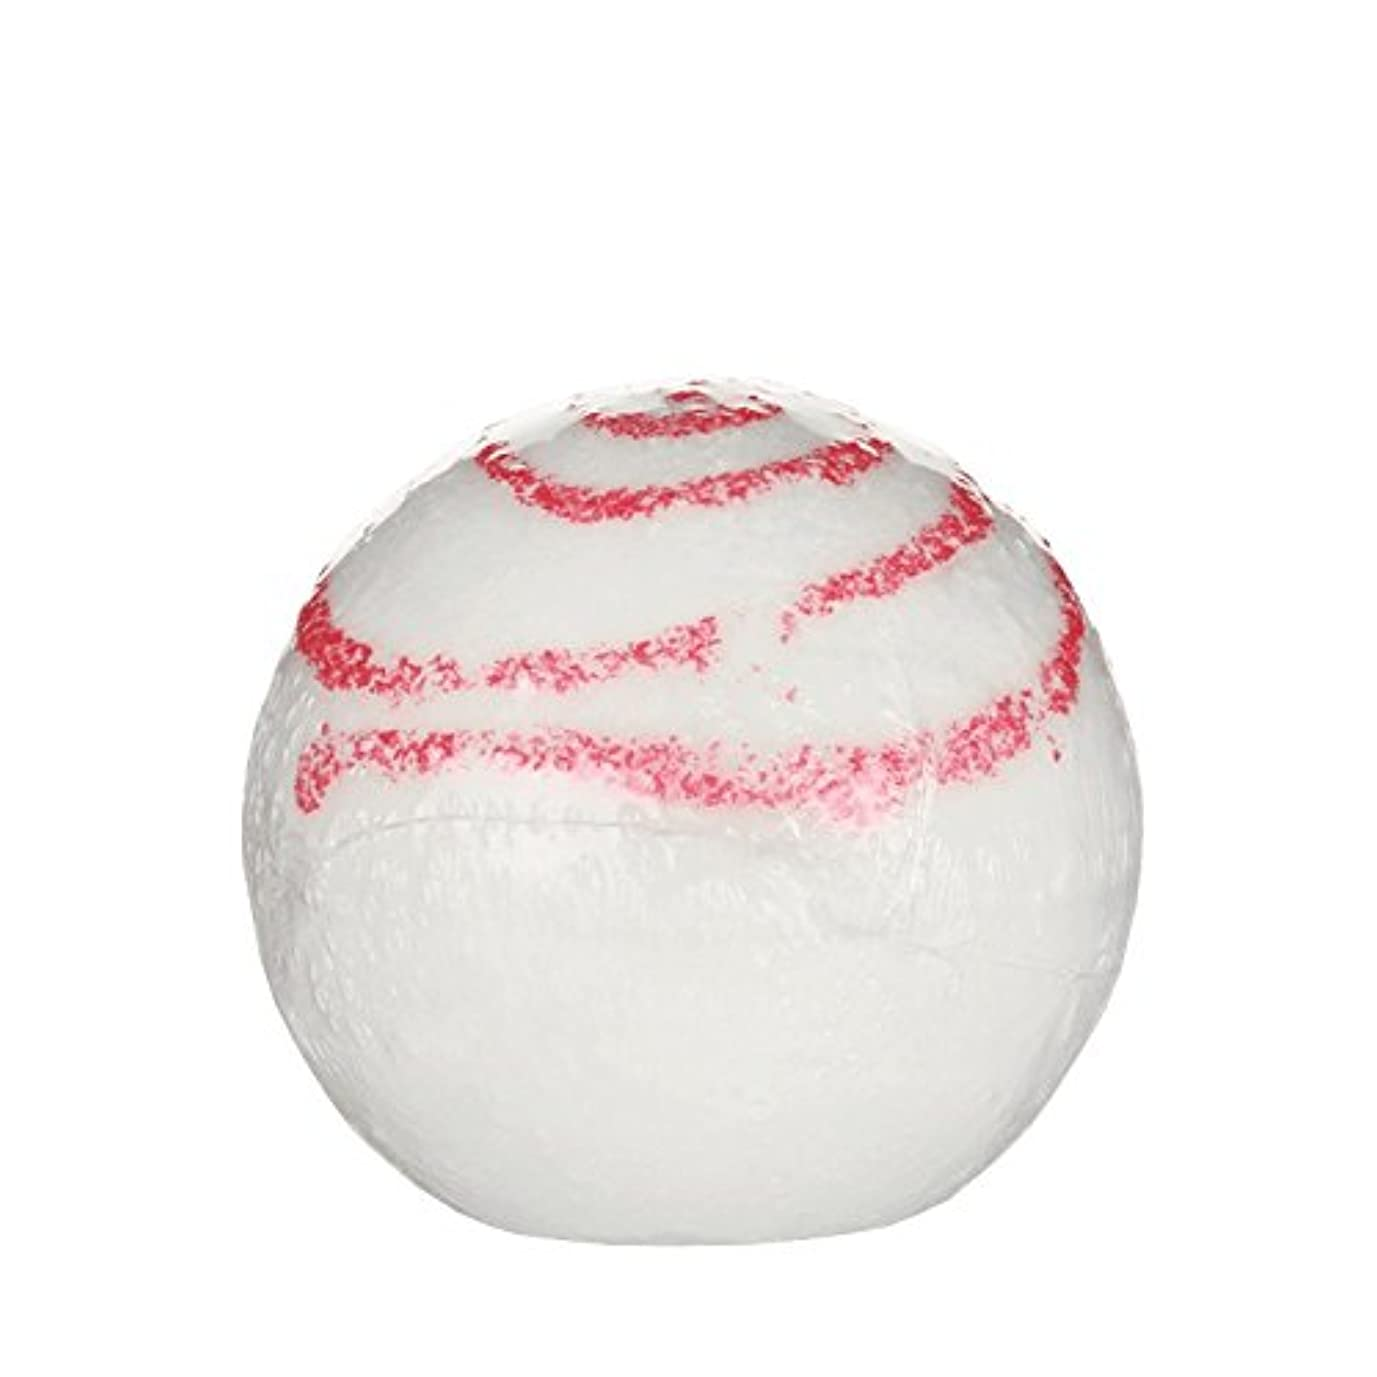 Treets Bath Ball Glitter Kiss 170g (Pack of 2) - Treetsバスボールグリッターキス170グラム (x2) [並行輸入品]